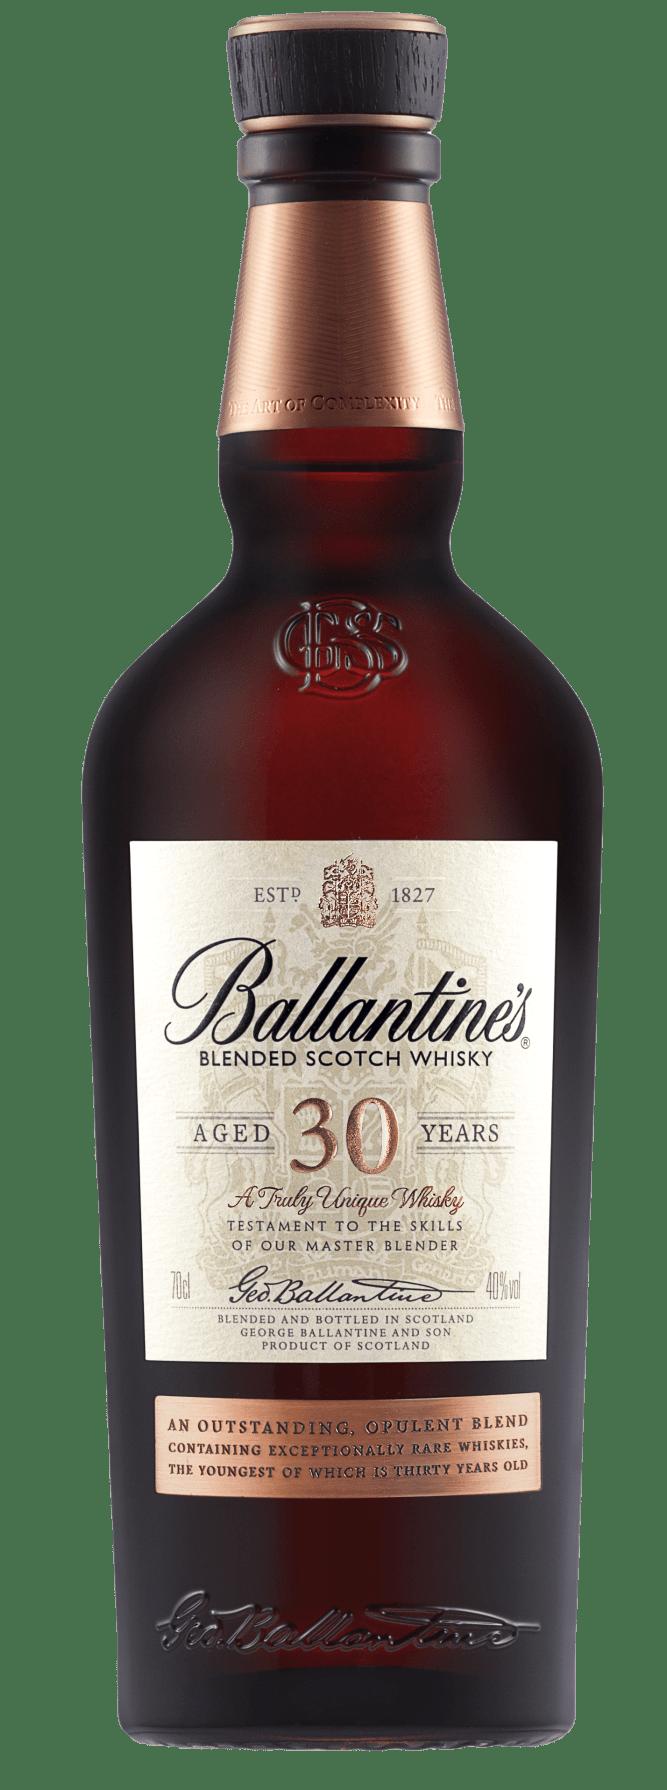 ballantines 30 year old 2